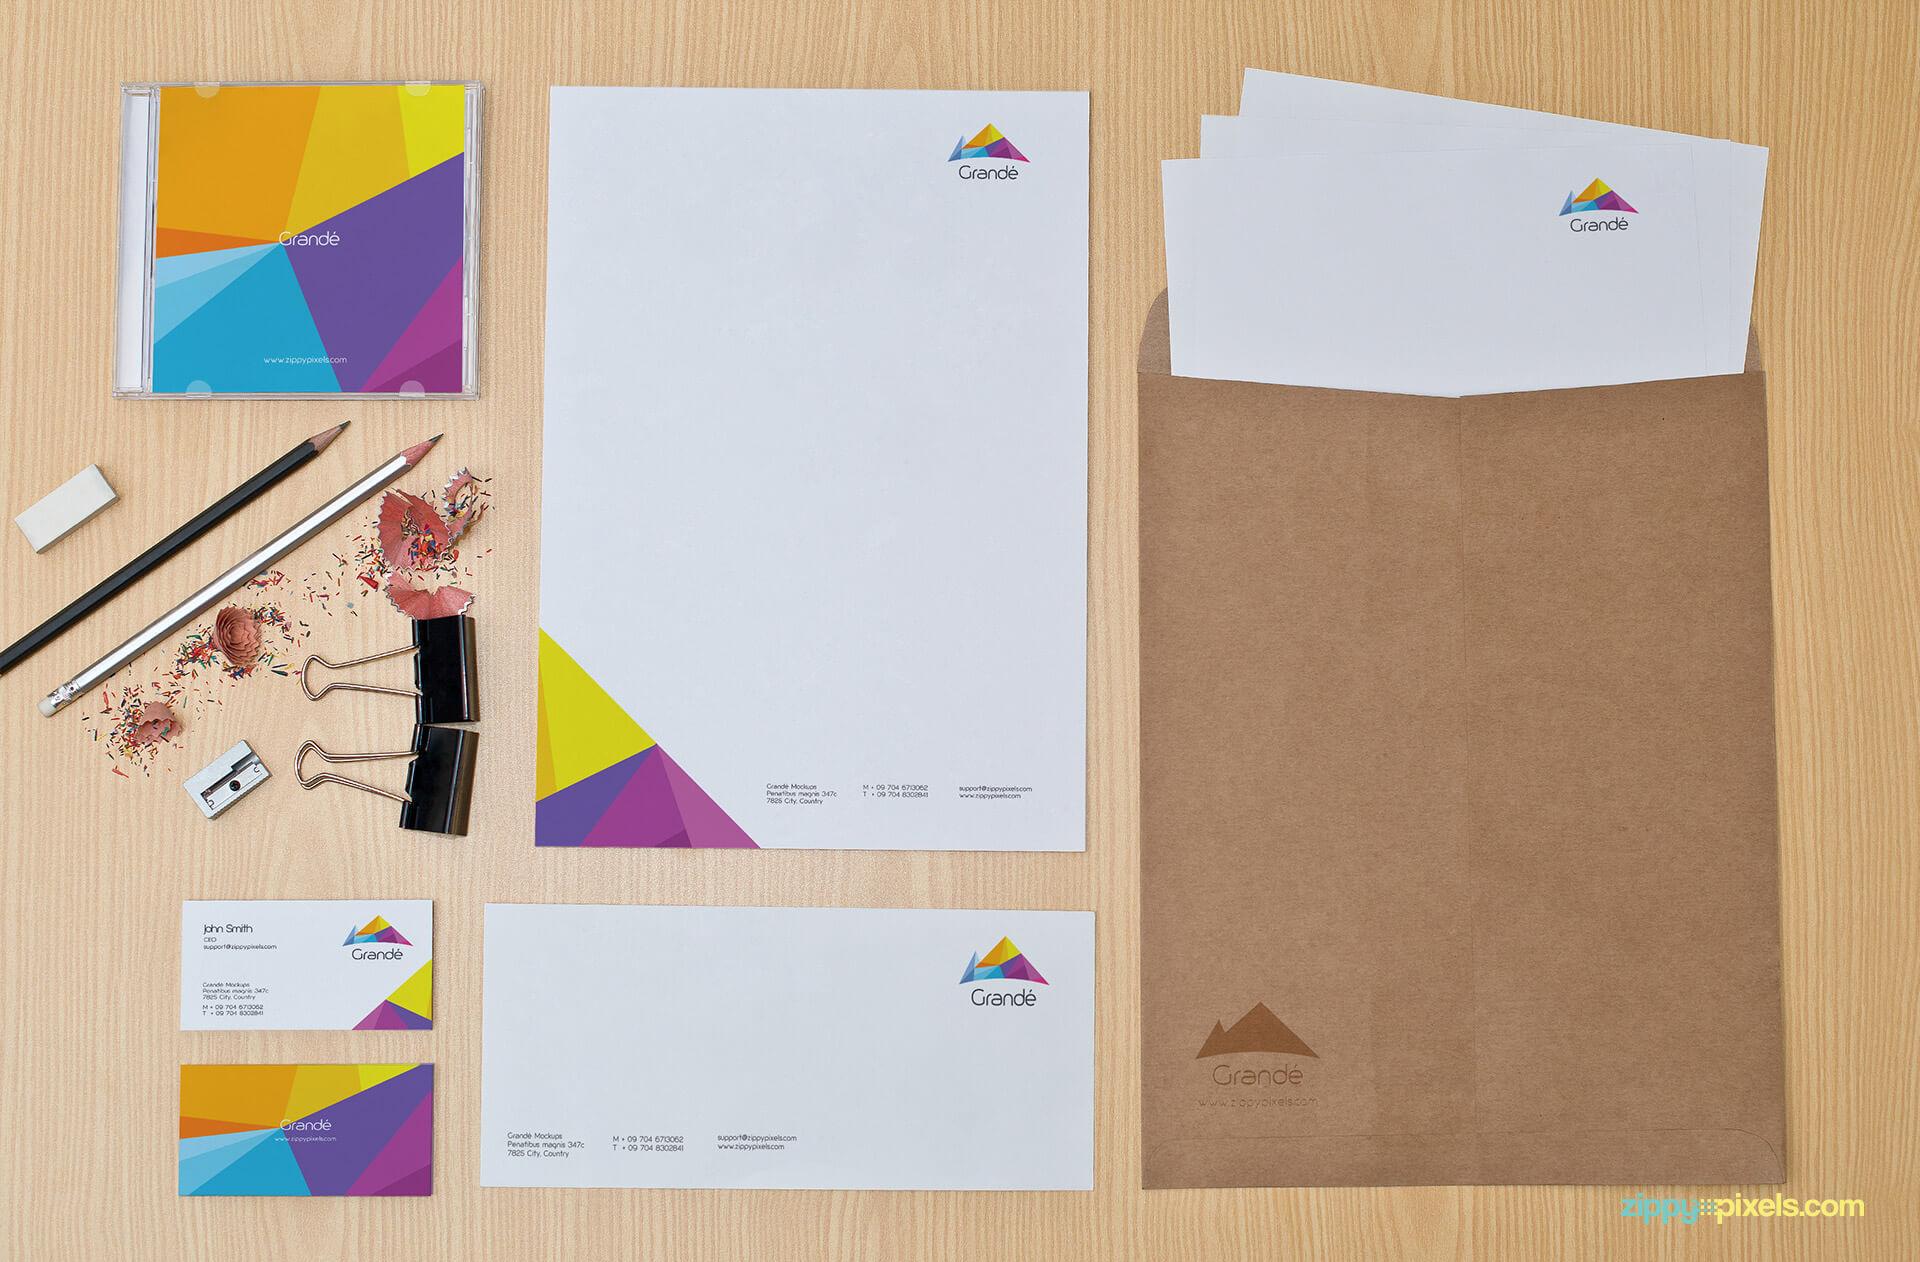 Brand Identity Stationery Mockup with Letterhead, Envelopers